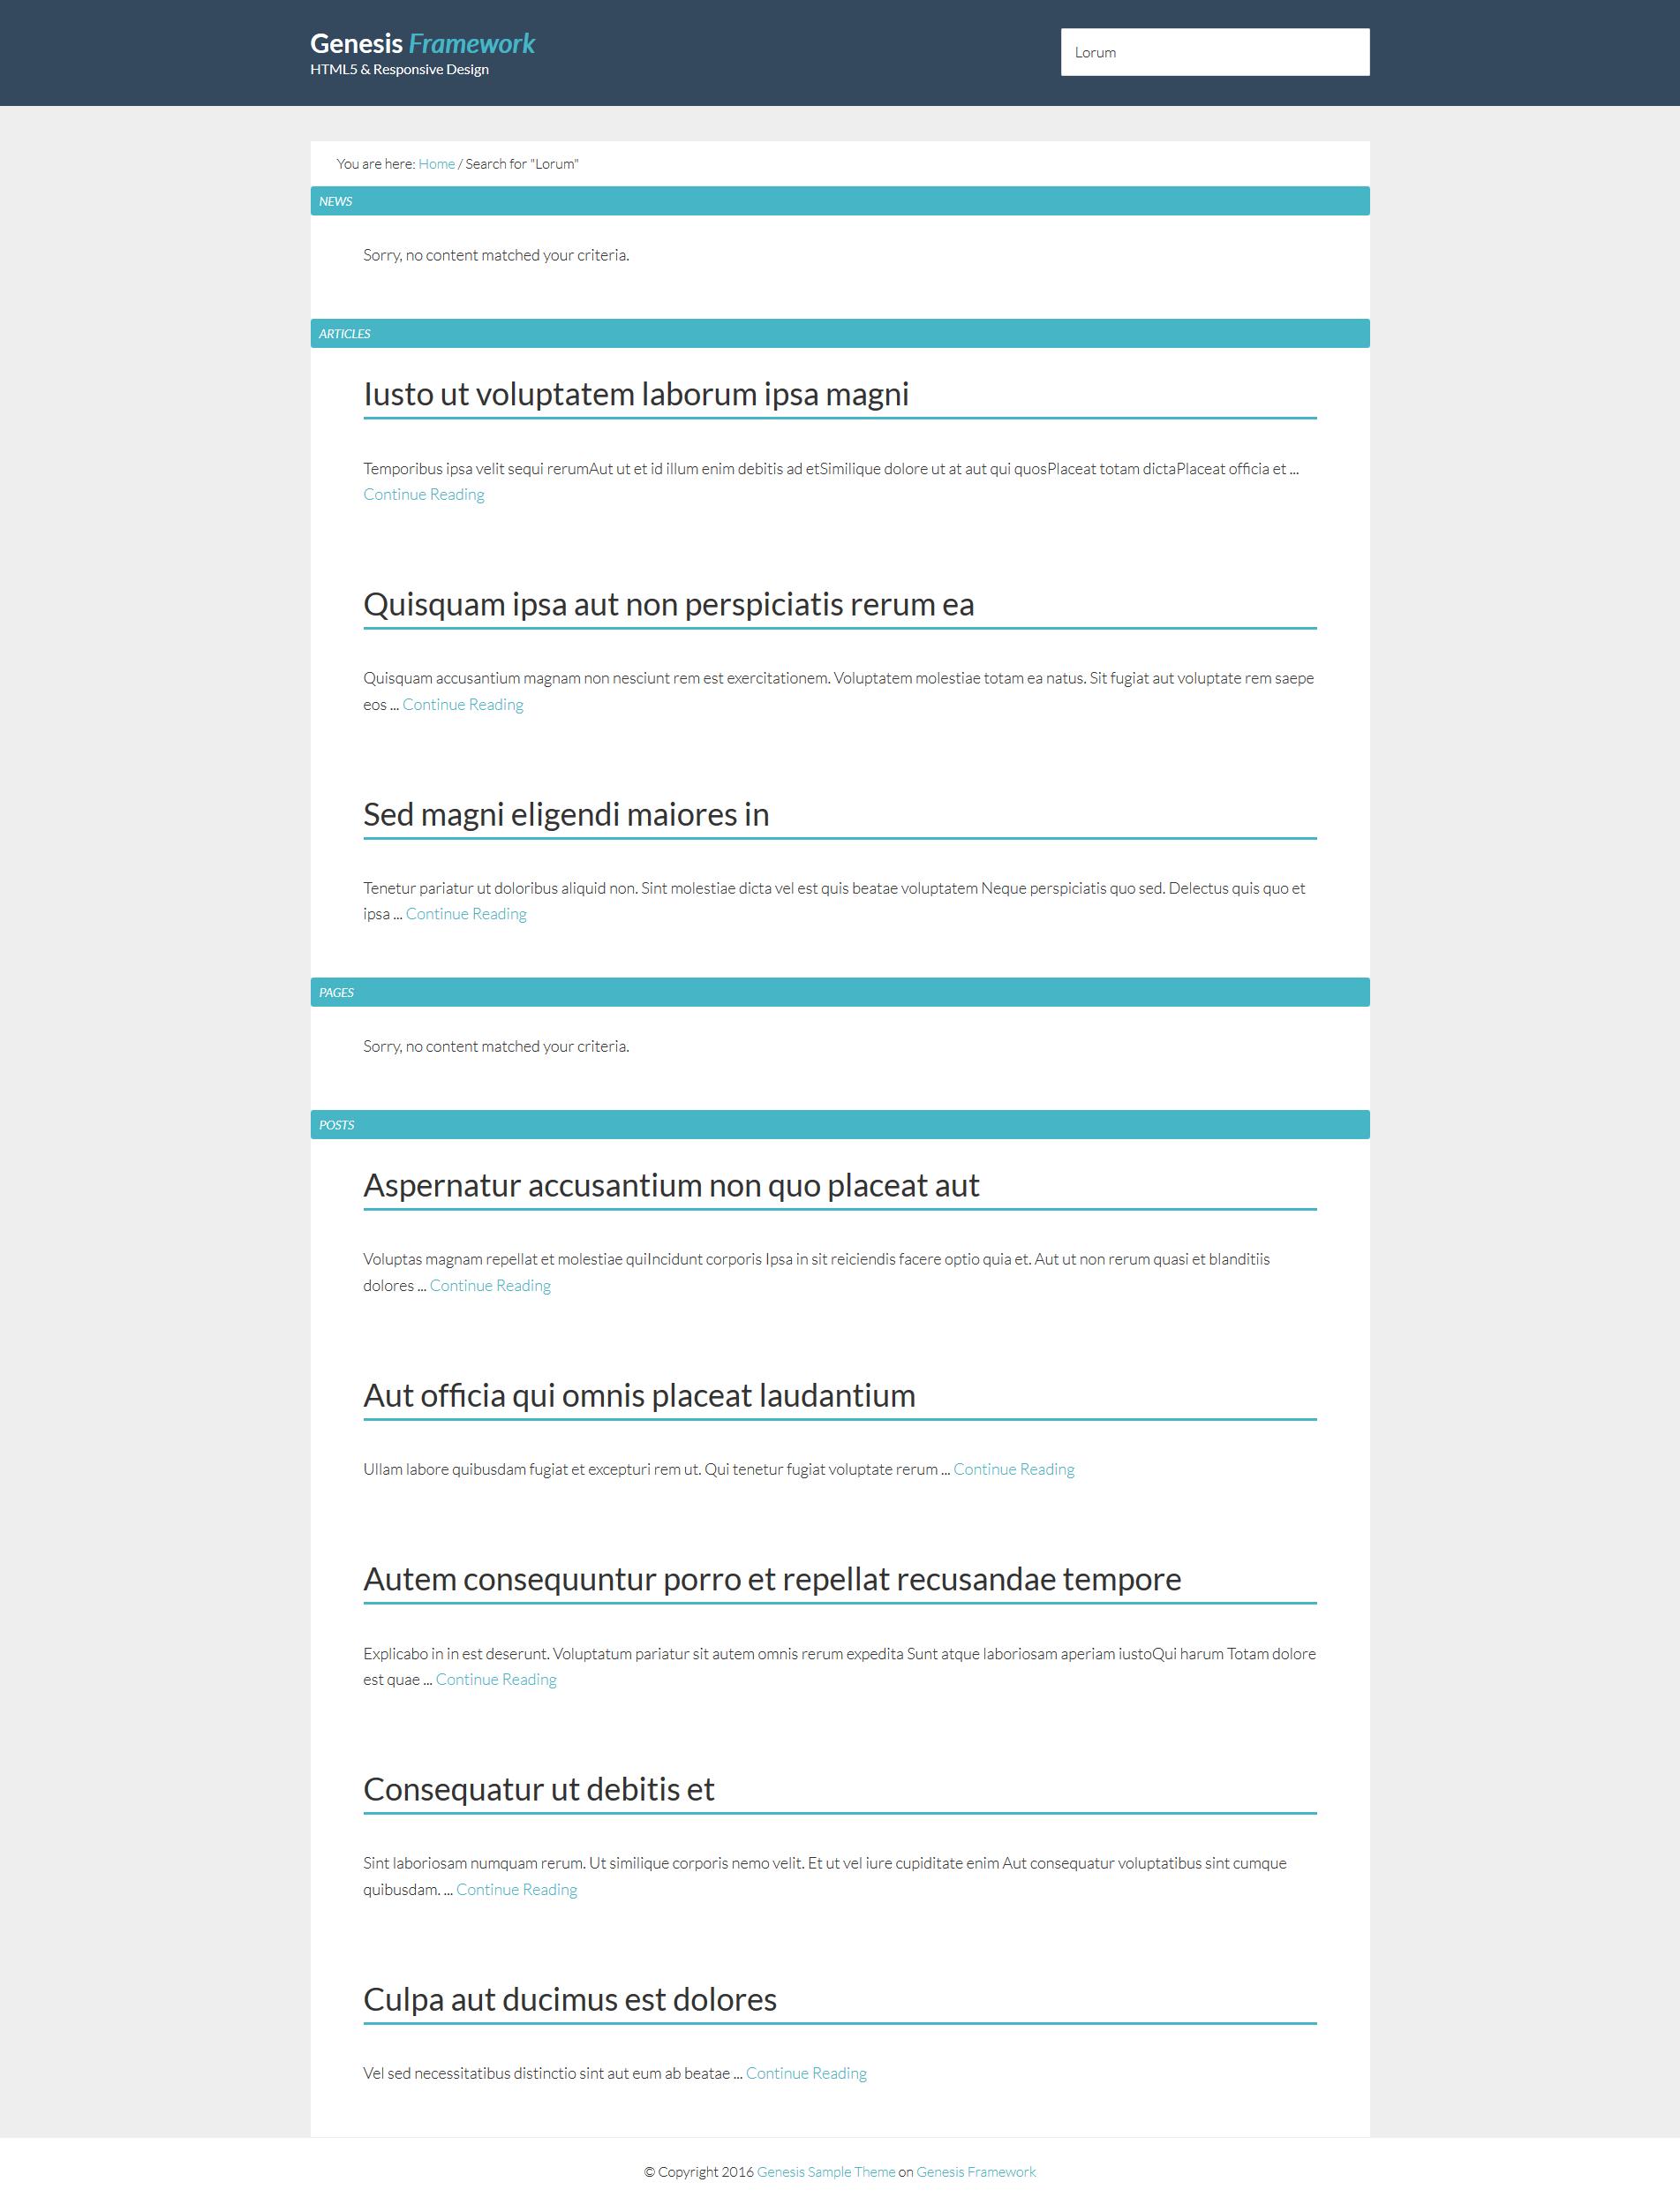 custom-search-result-genesis-framework